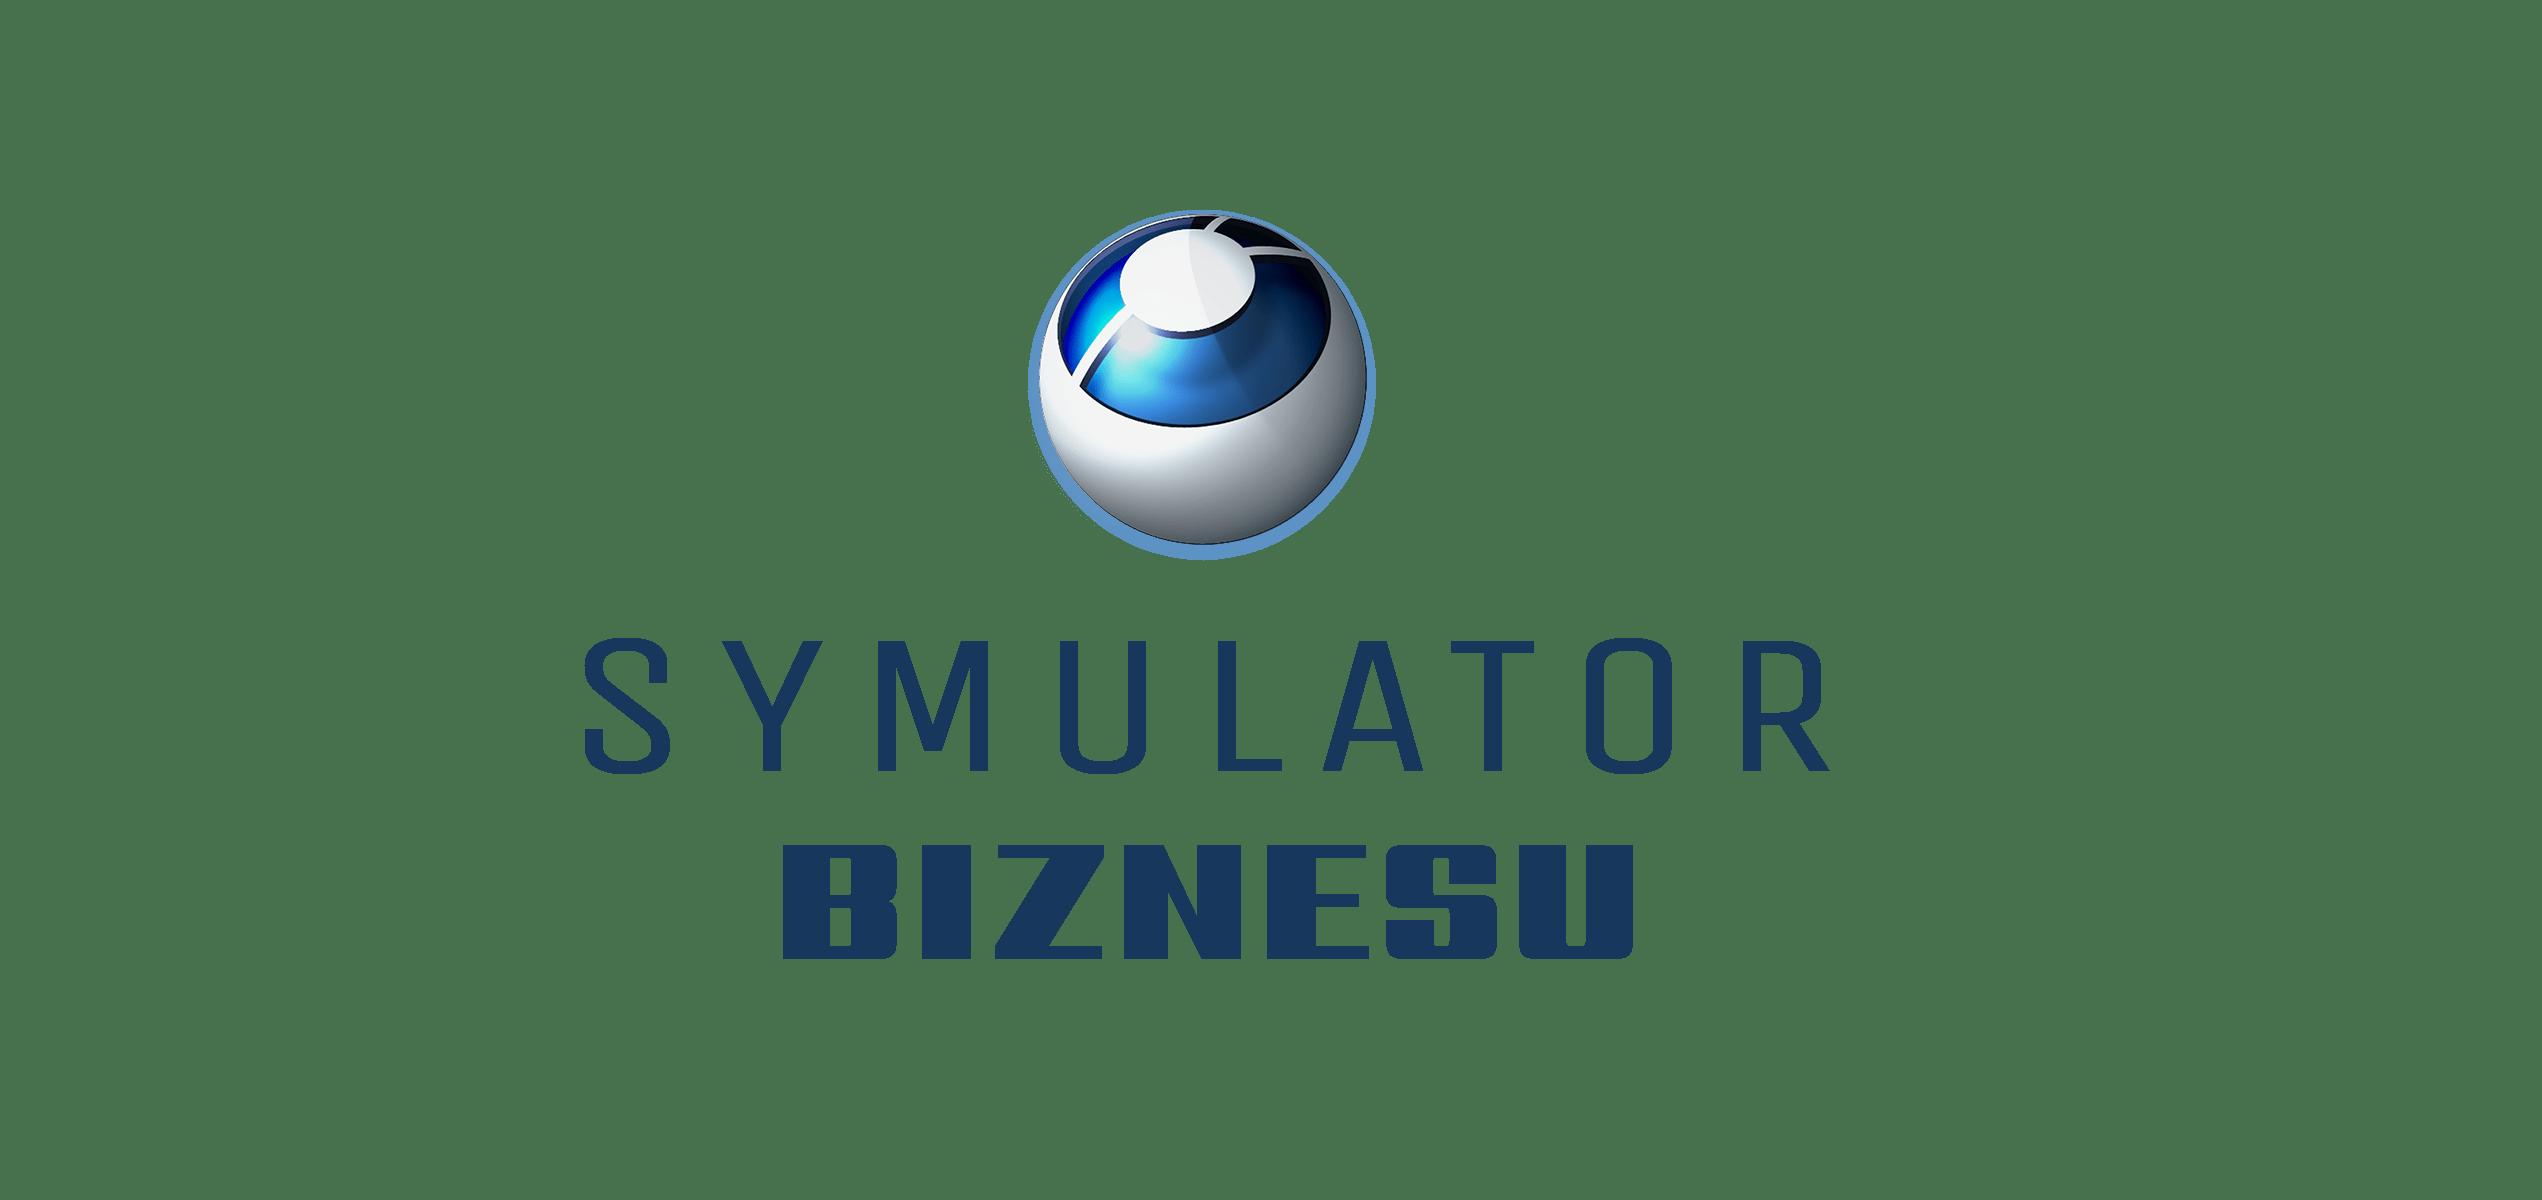 Symulator Biznesu